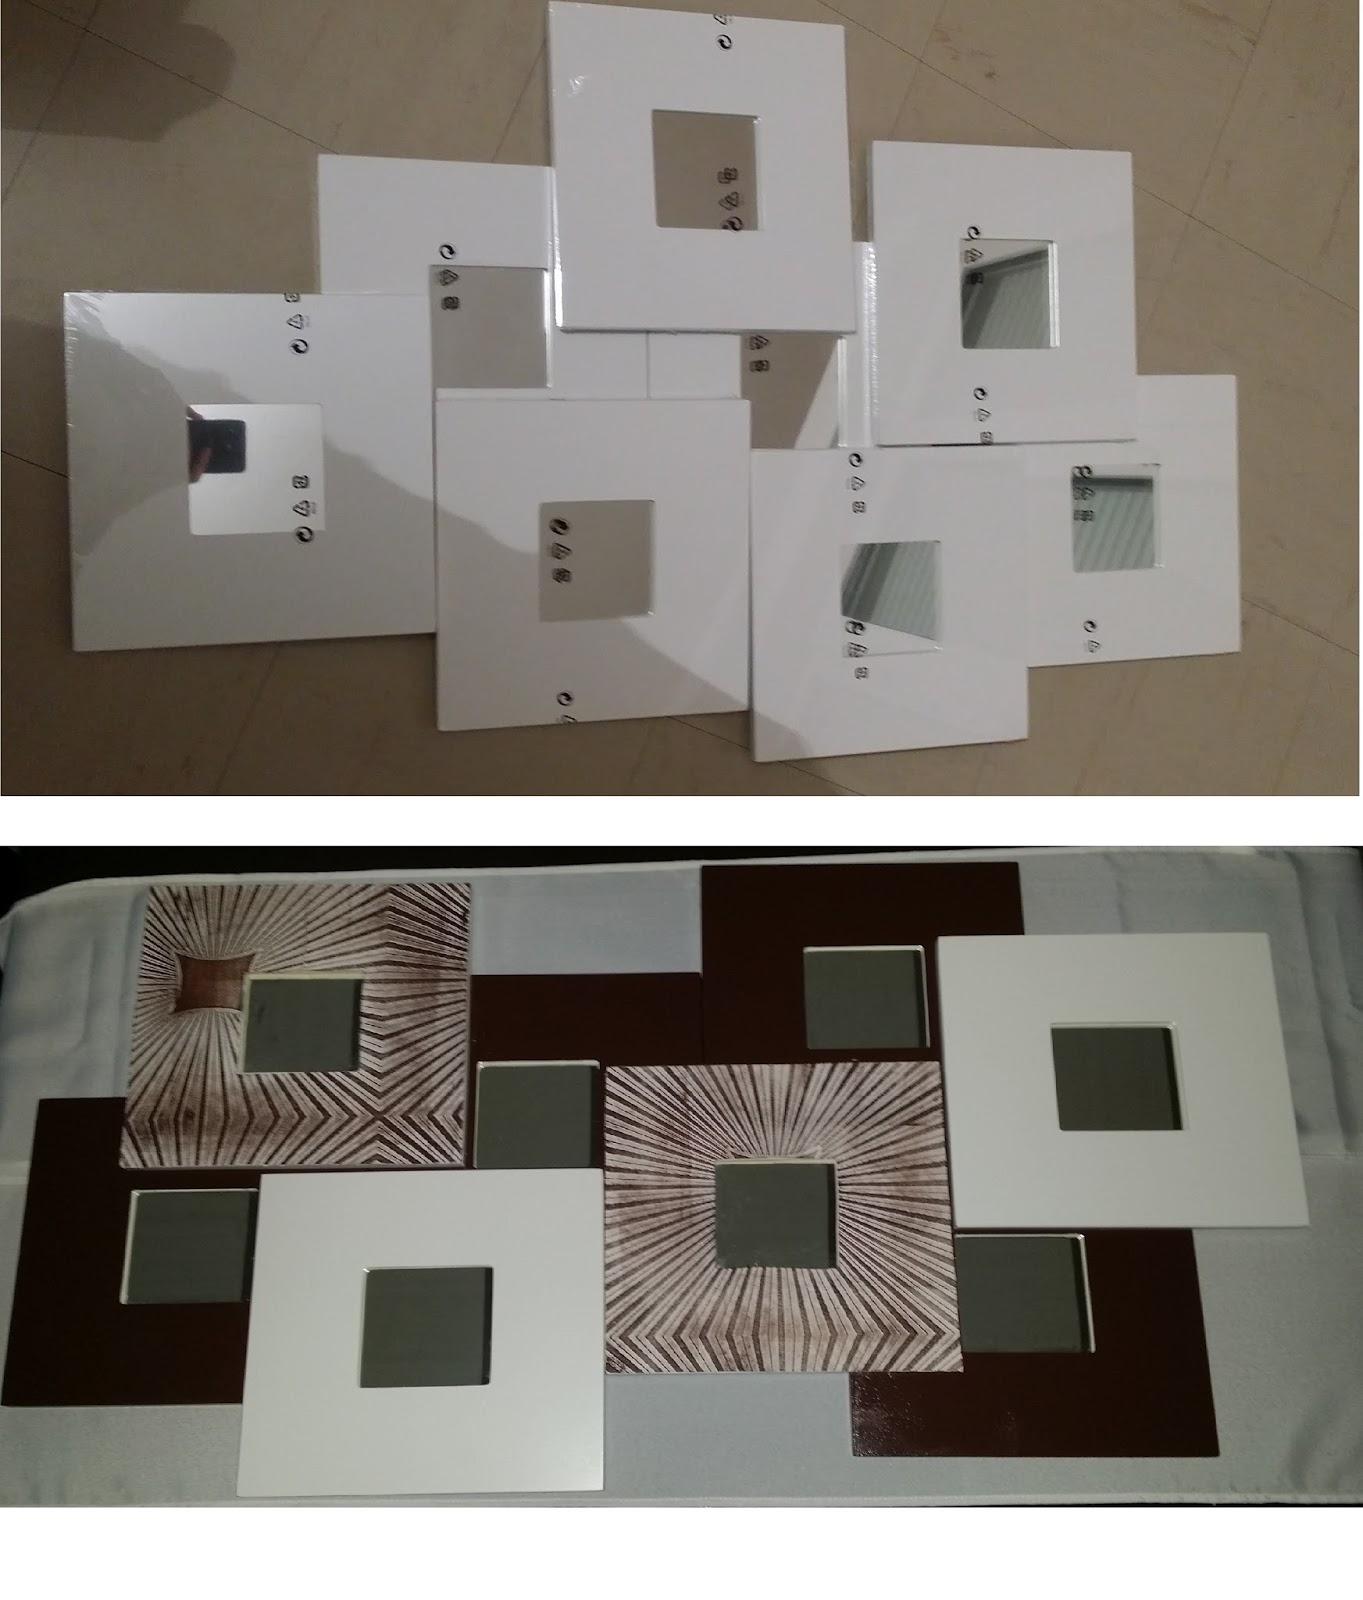 Customiser Un Cadre De Miroir customiser ses meuble: miroir malma